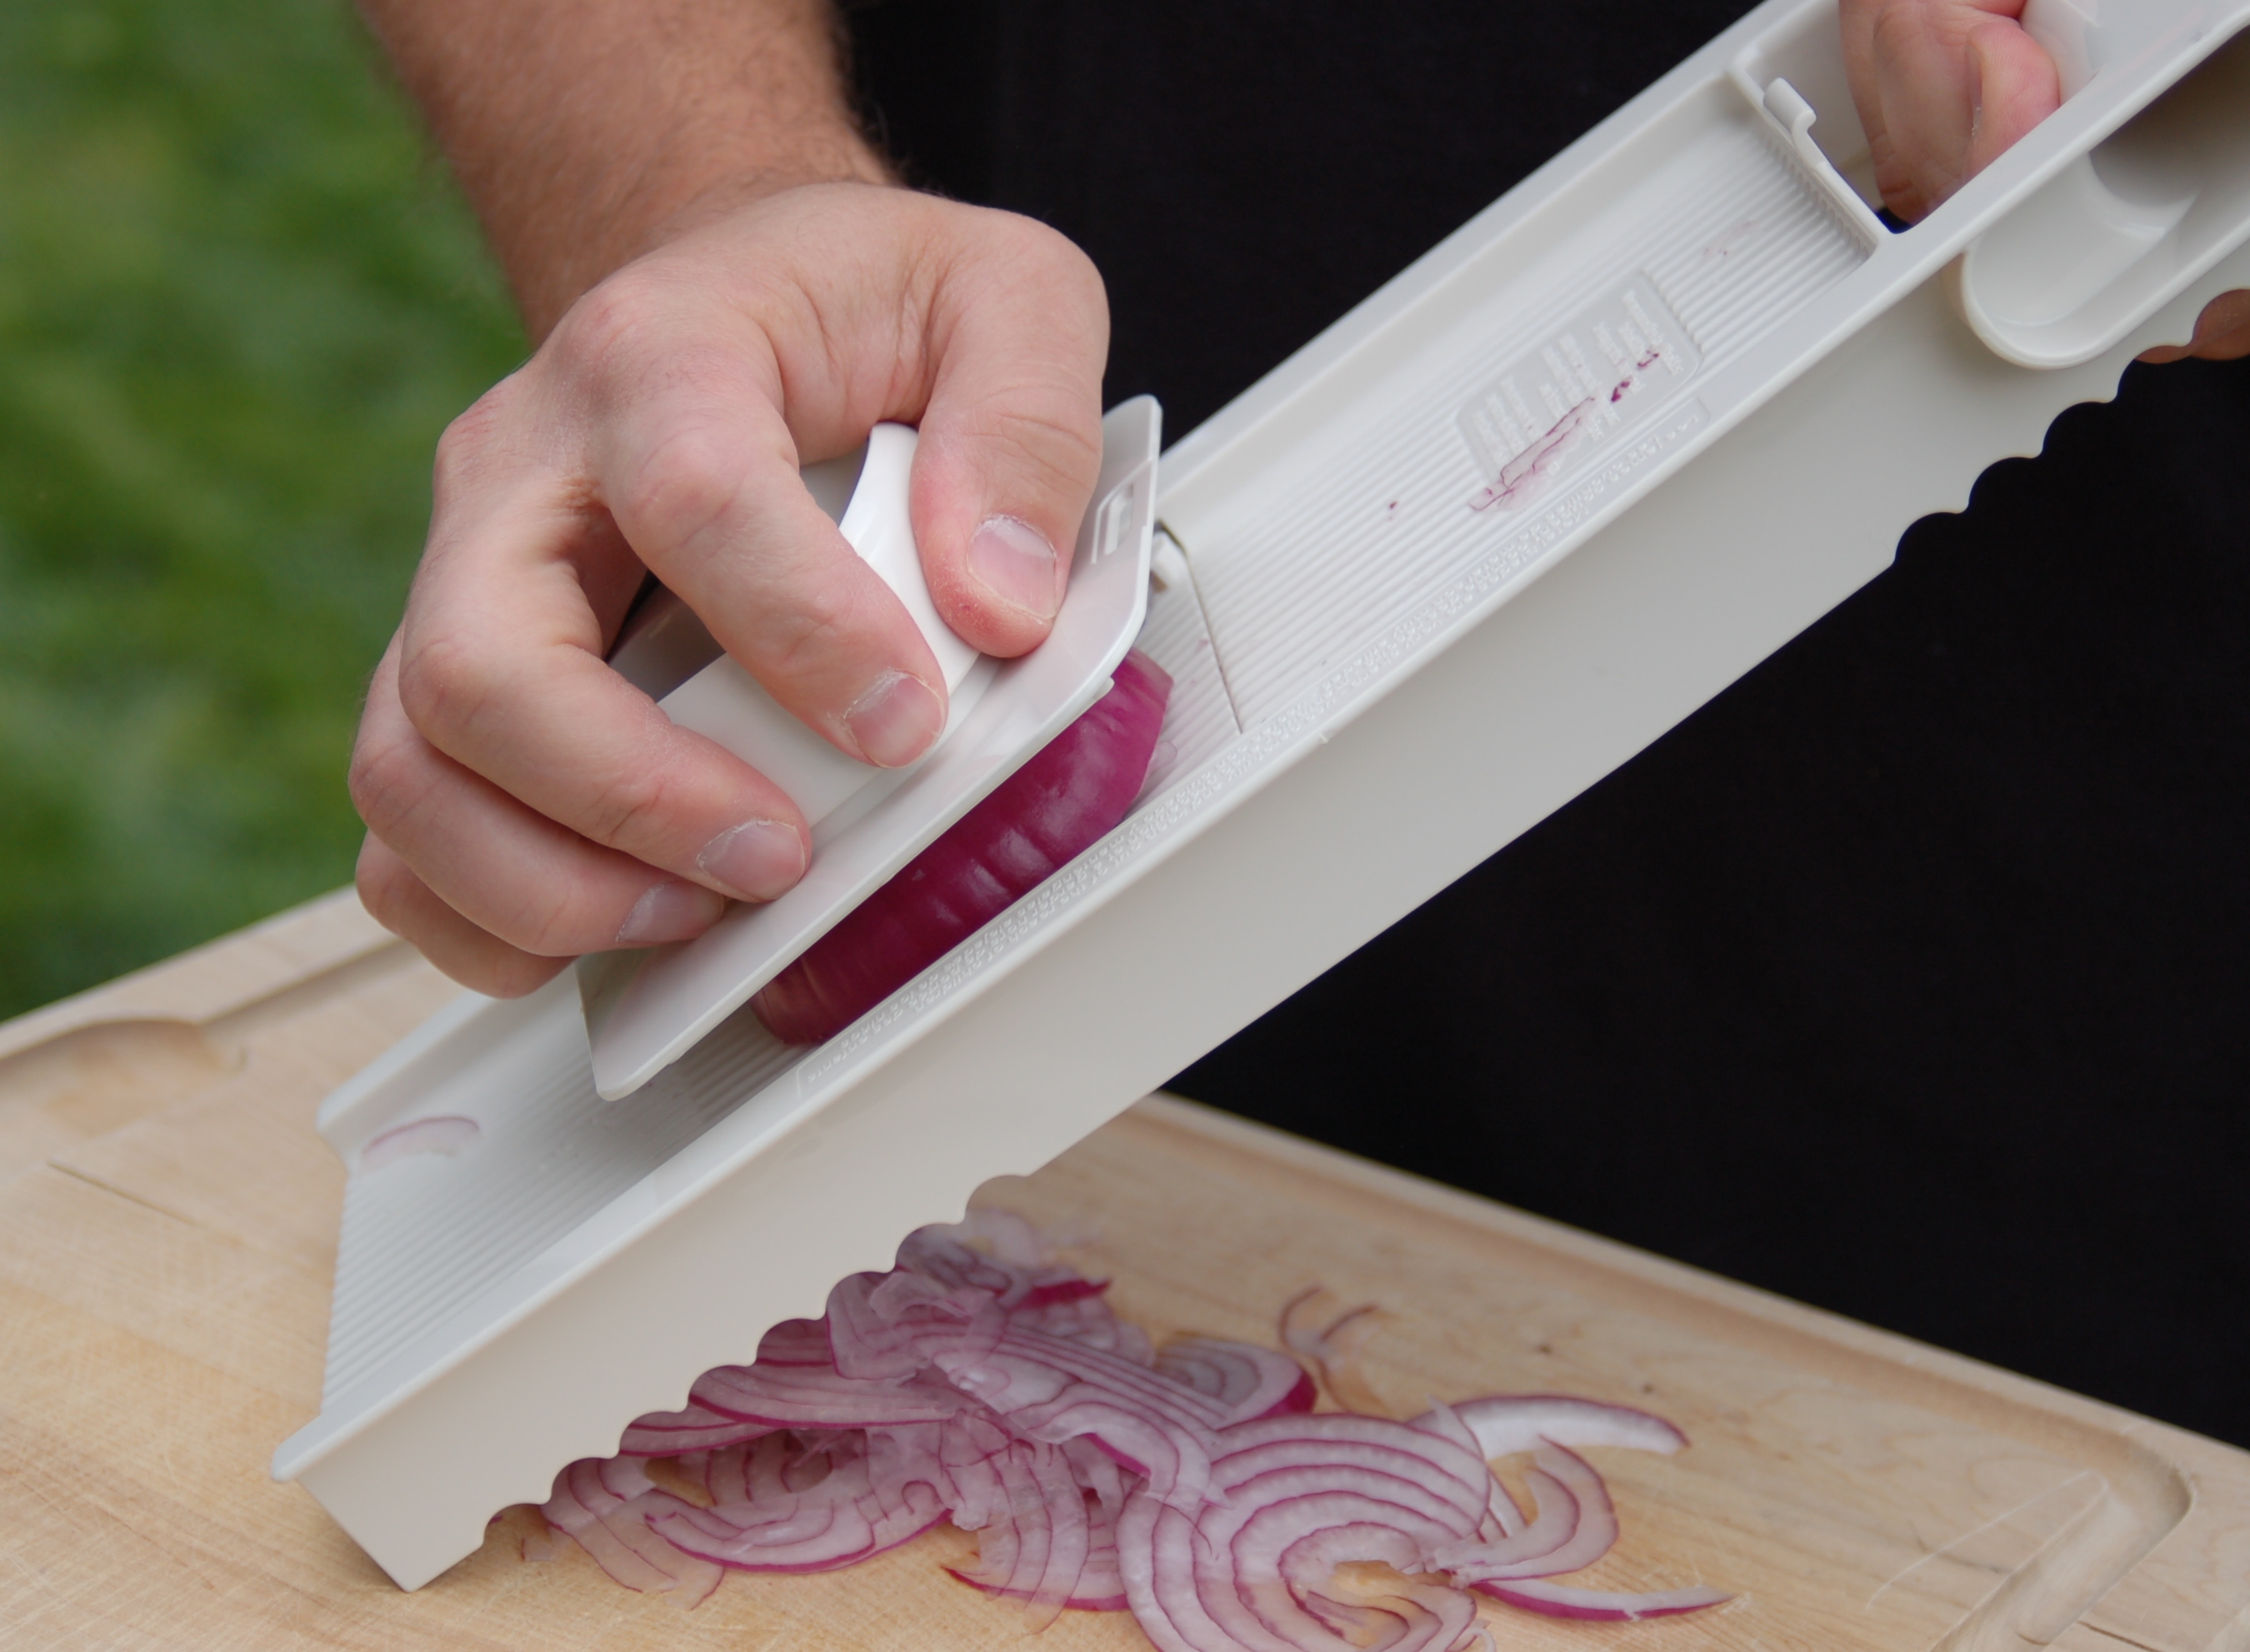 Mandolin kitchen slicer Photo - 1